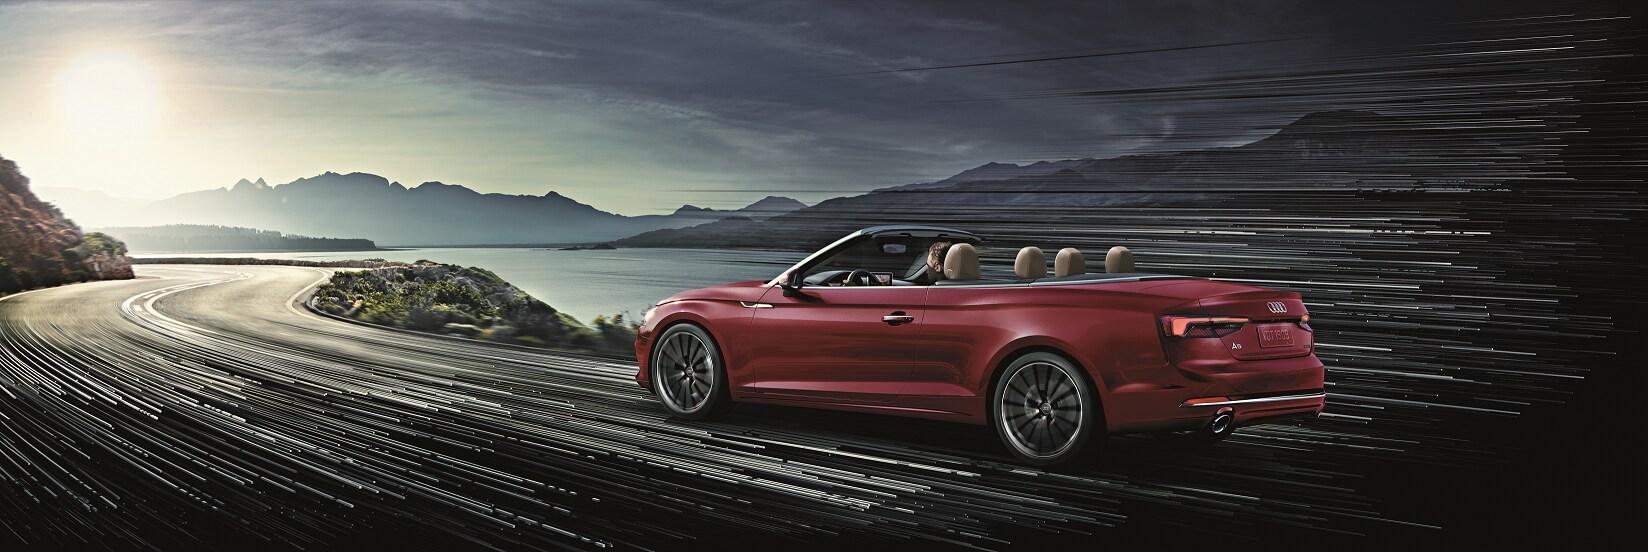 Audi Lease Deals >> Audi Lease Deals Hollywood Fl Audi North Miami